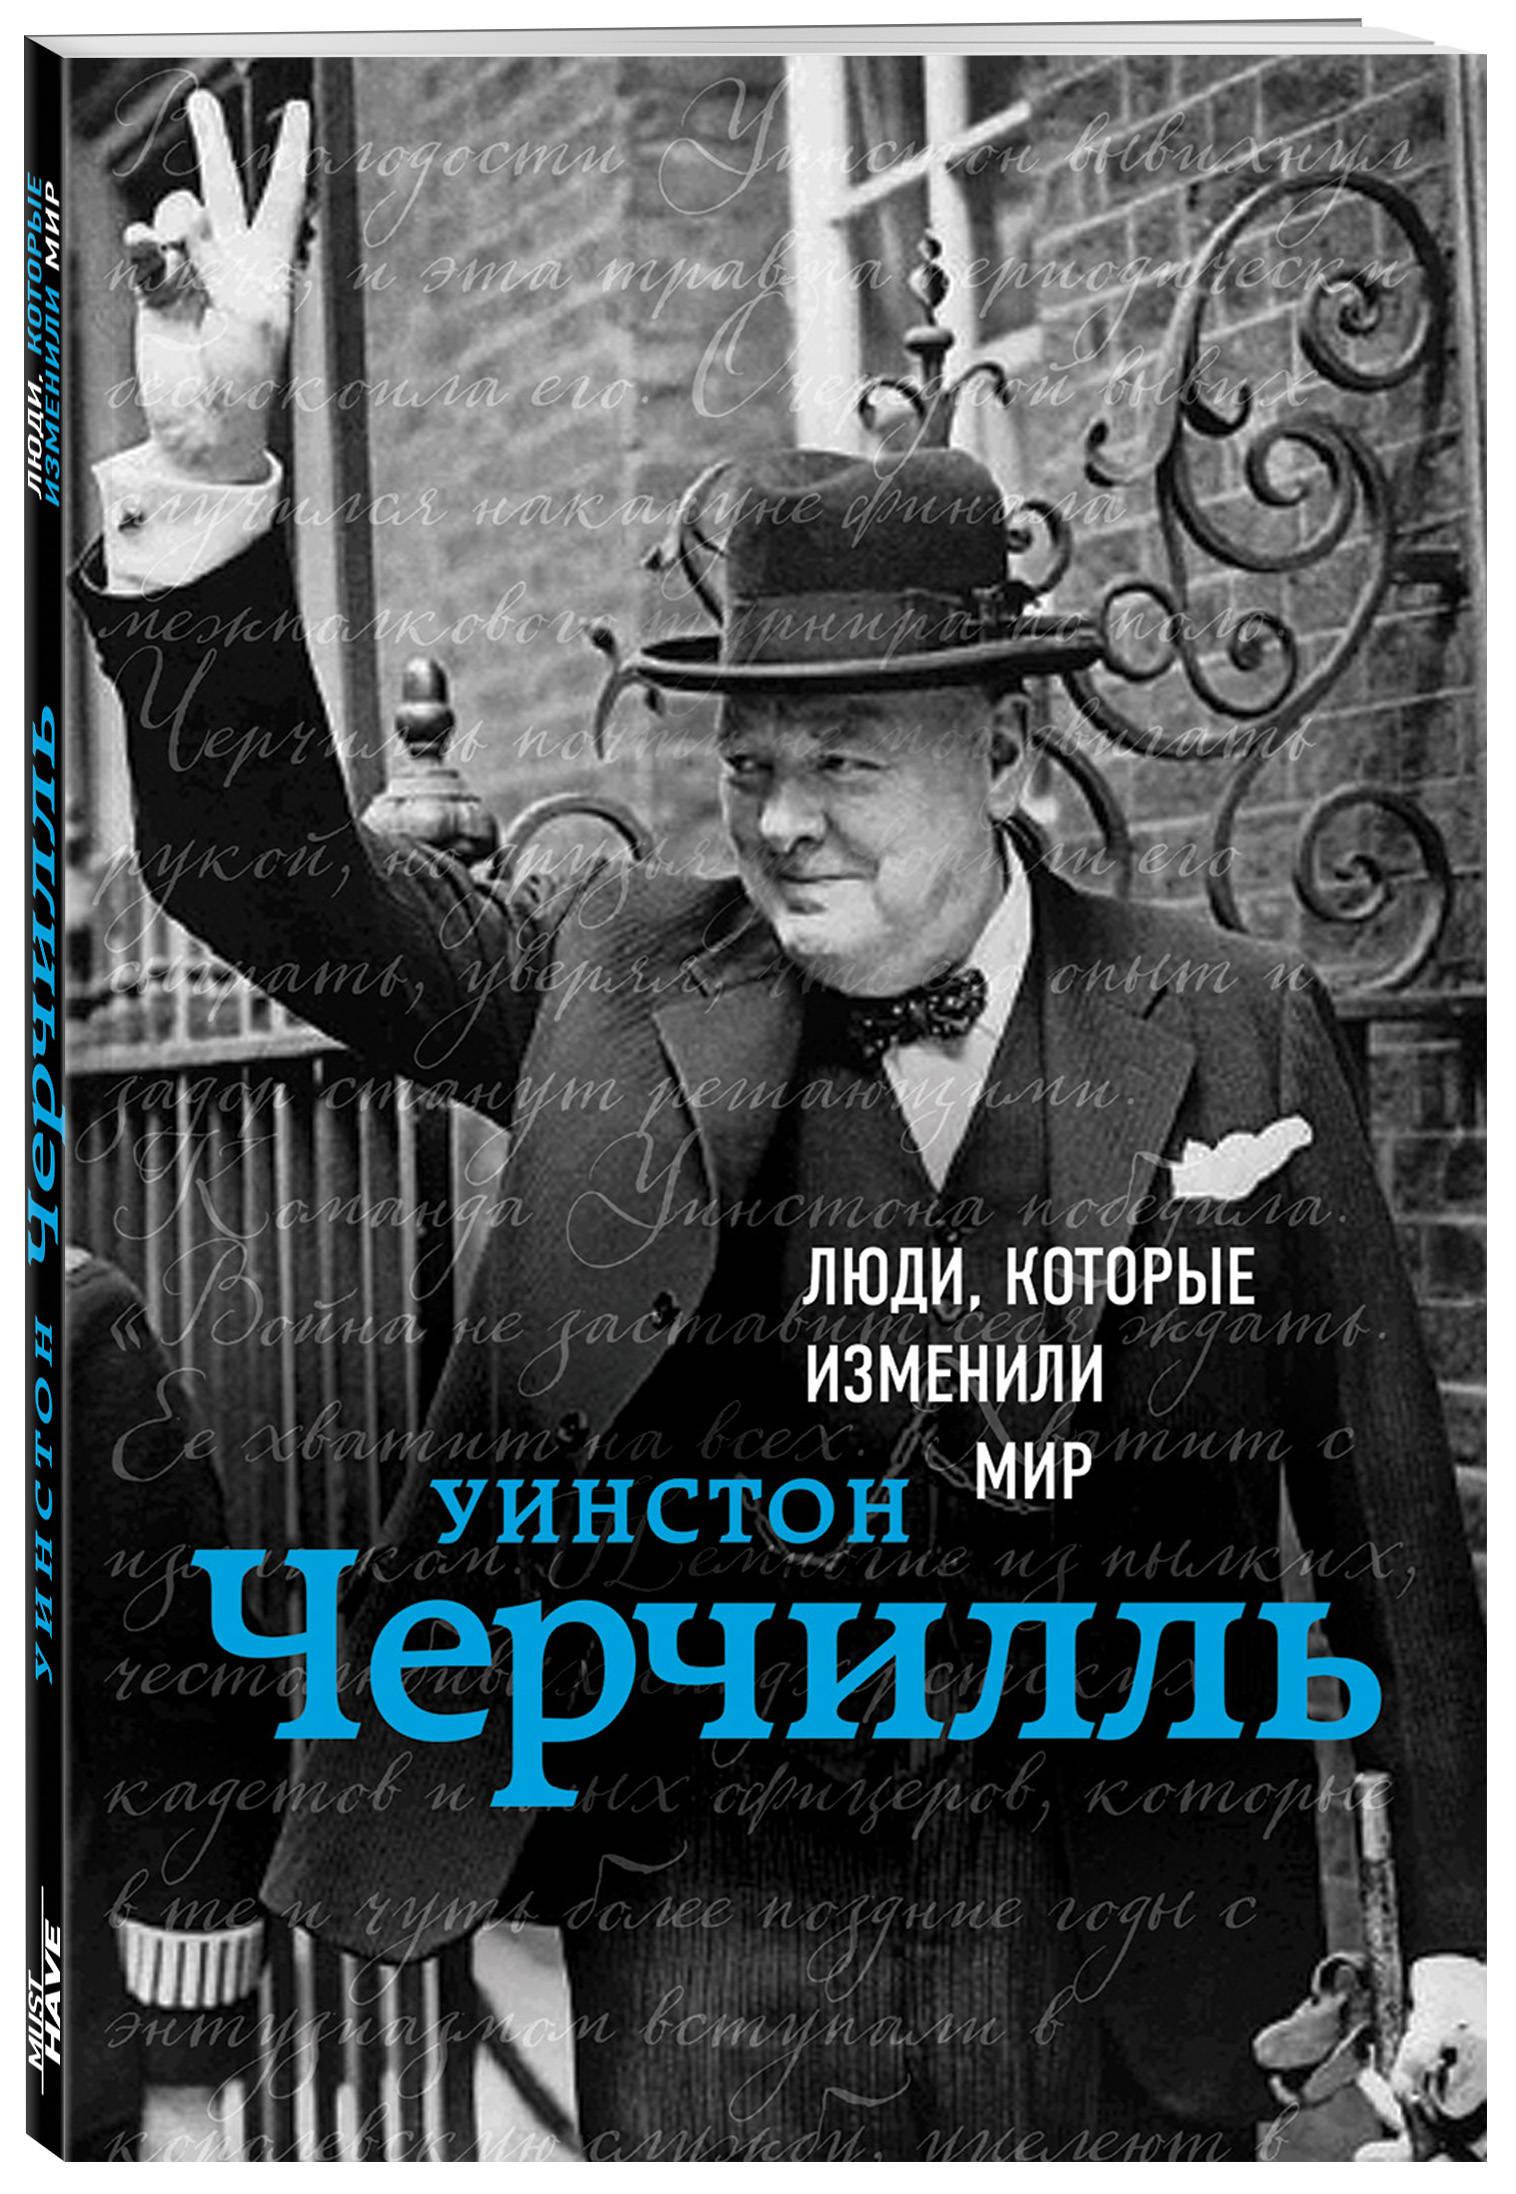 Уинстон Черчилль. Биография